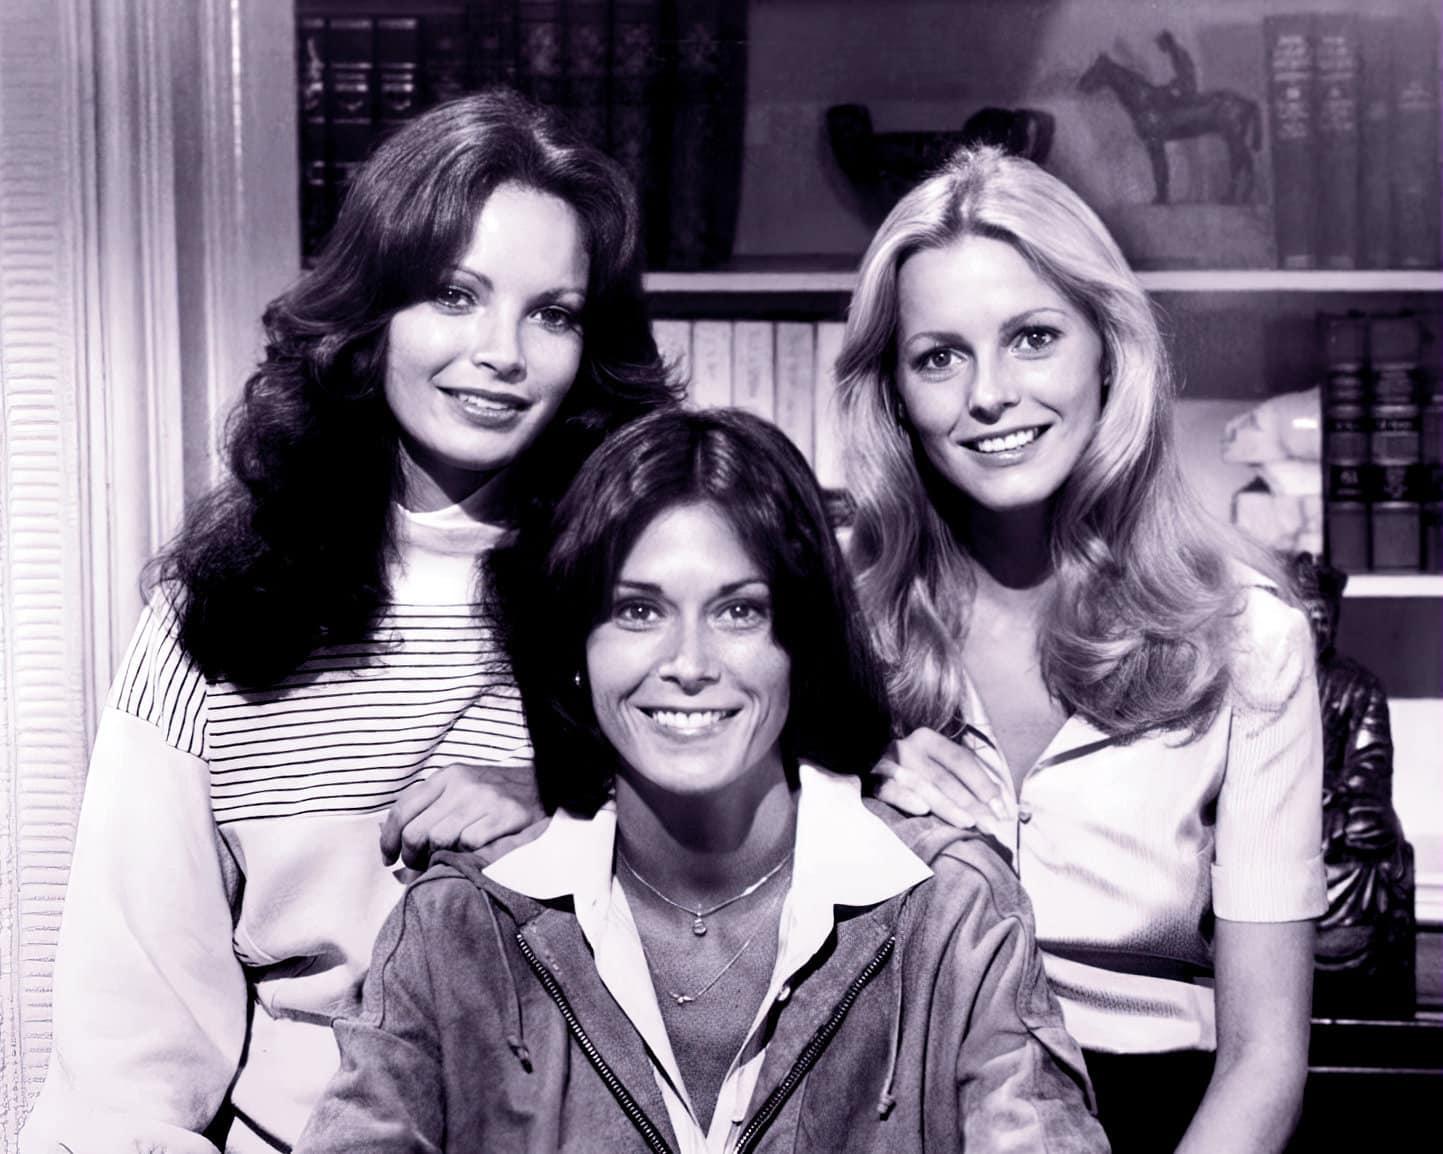 Charlie's Angels cast - Season 2 (1977)